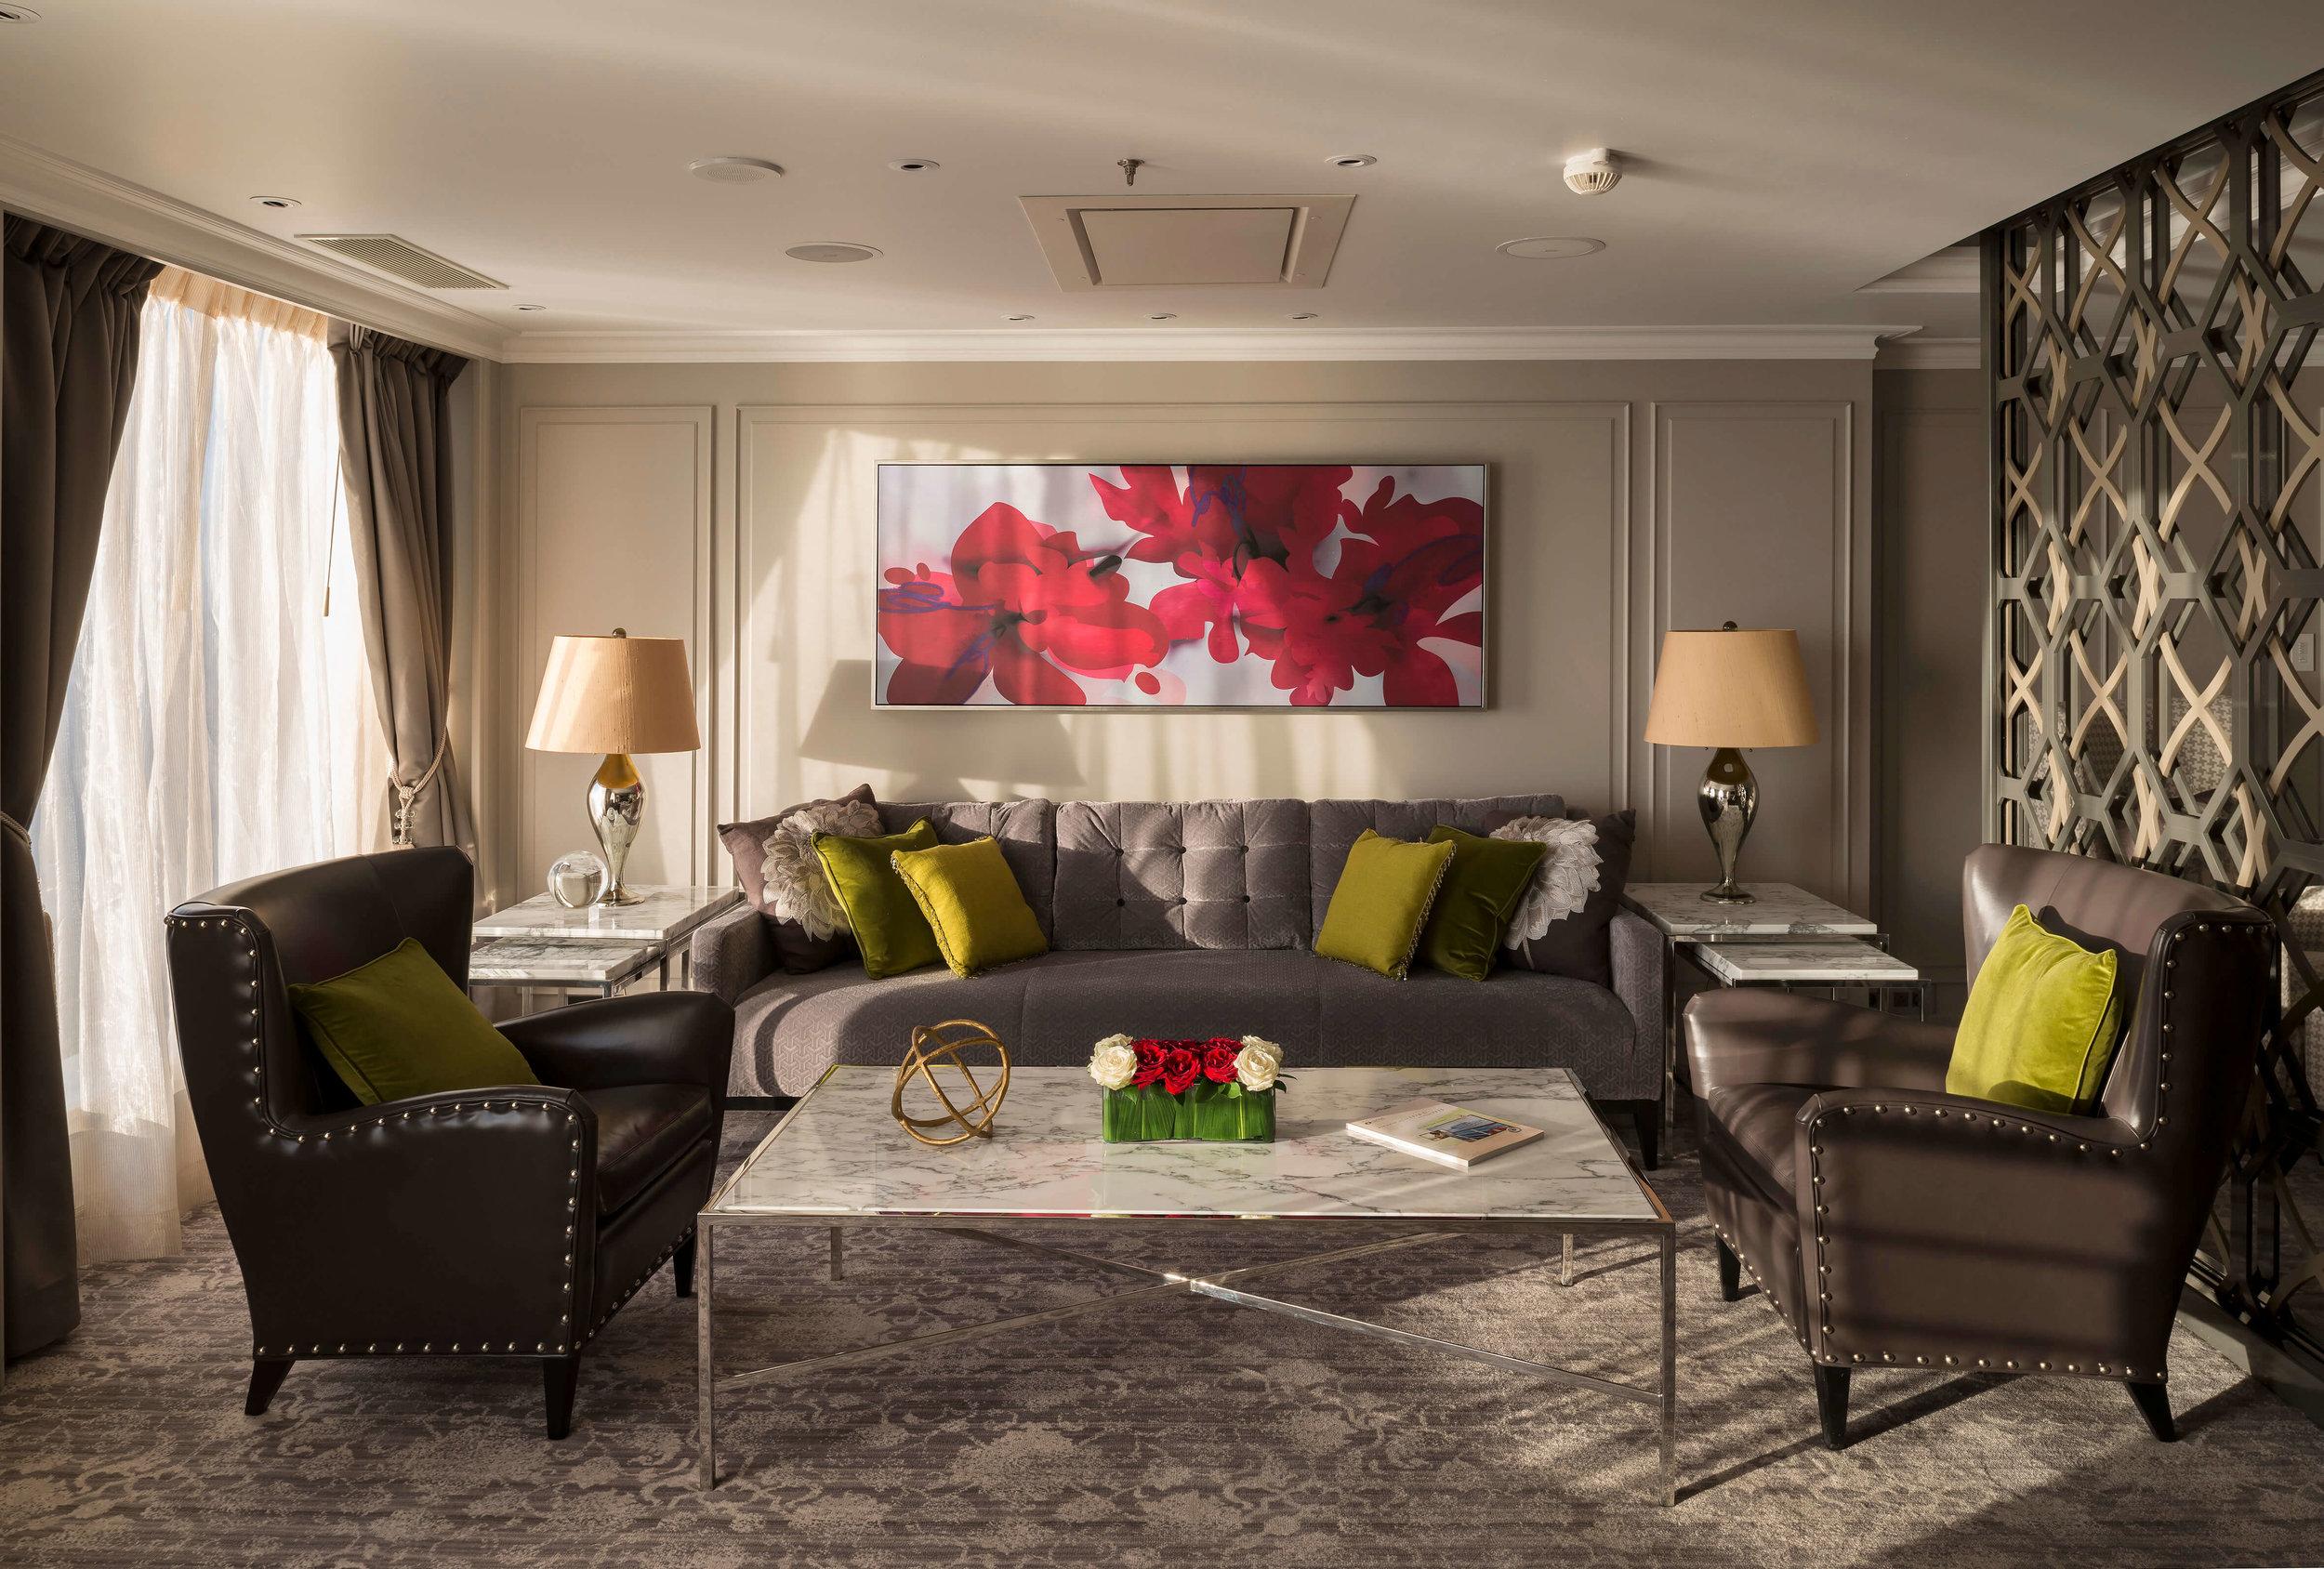 serenity_crystal_penthouse_livingroom_4724x3189c413963d14a76ba6be24ff000080b40b.jpg